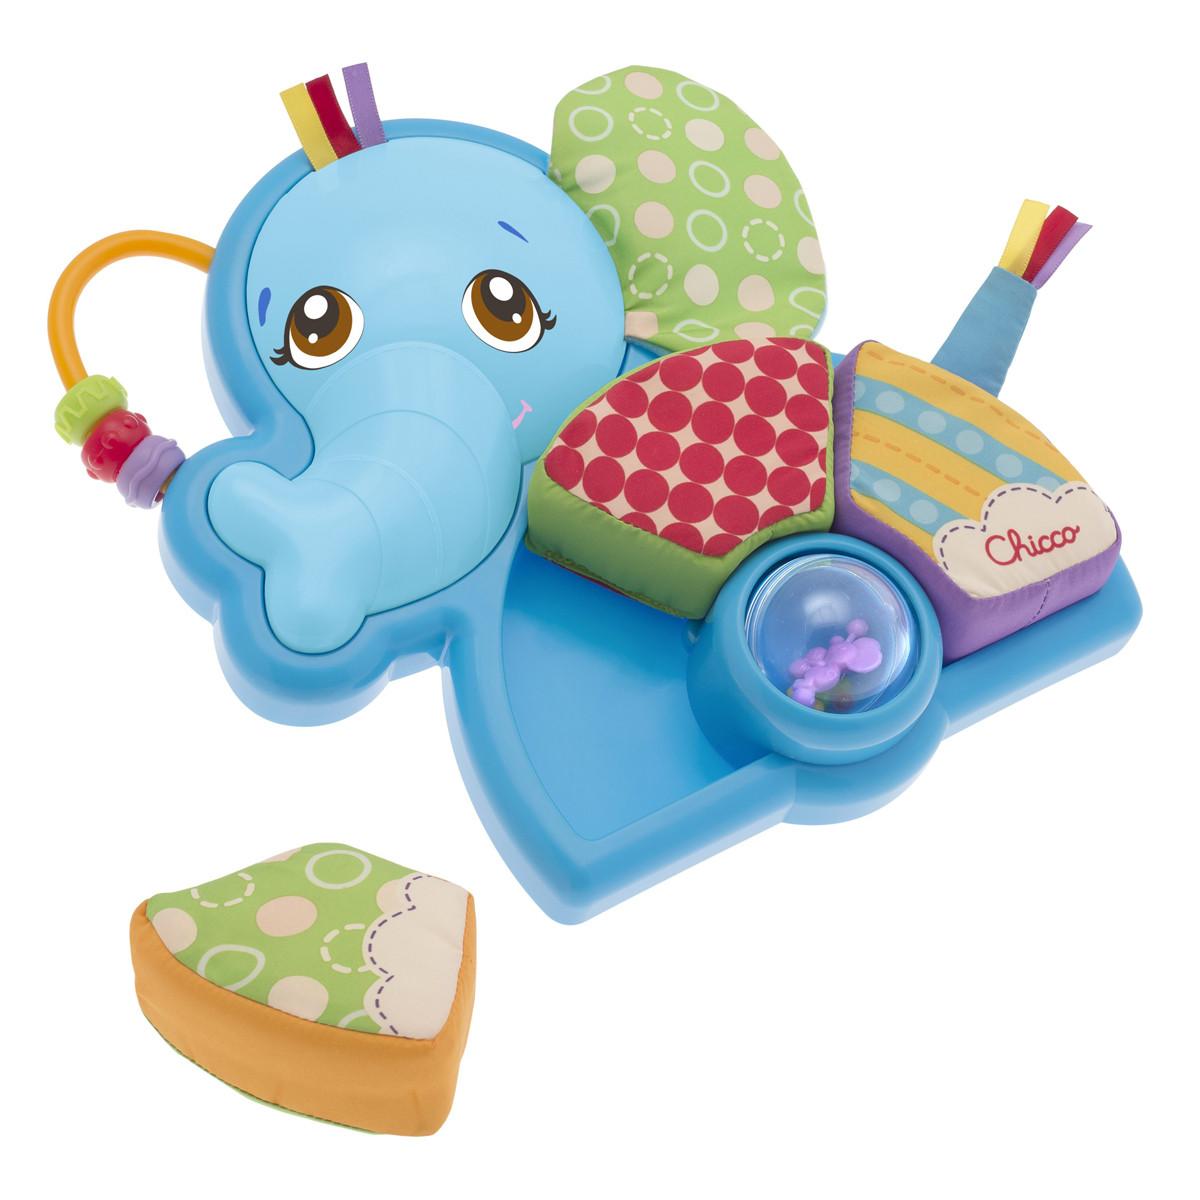 Chicco Mr. Elephant Puzzle